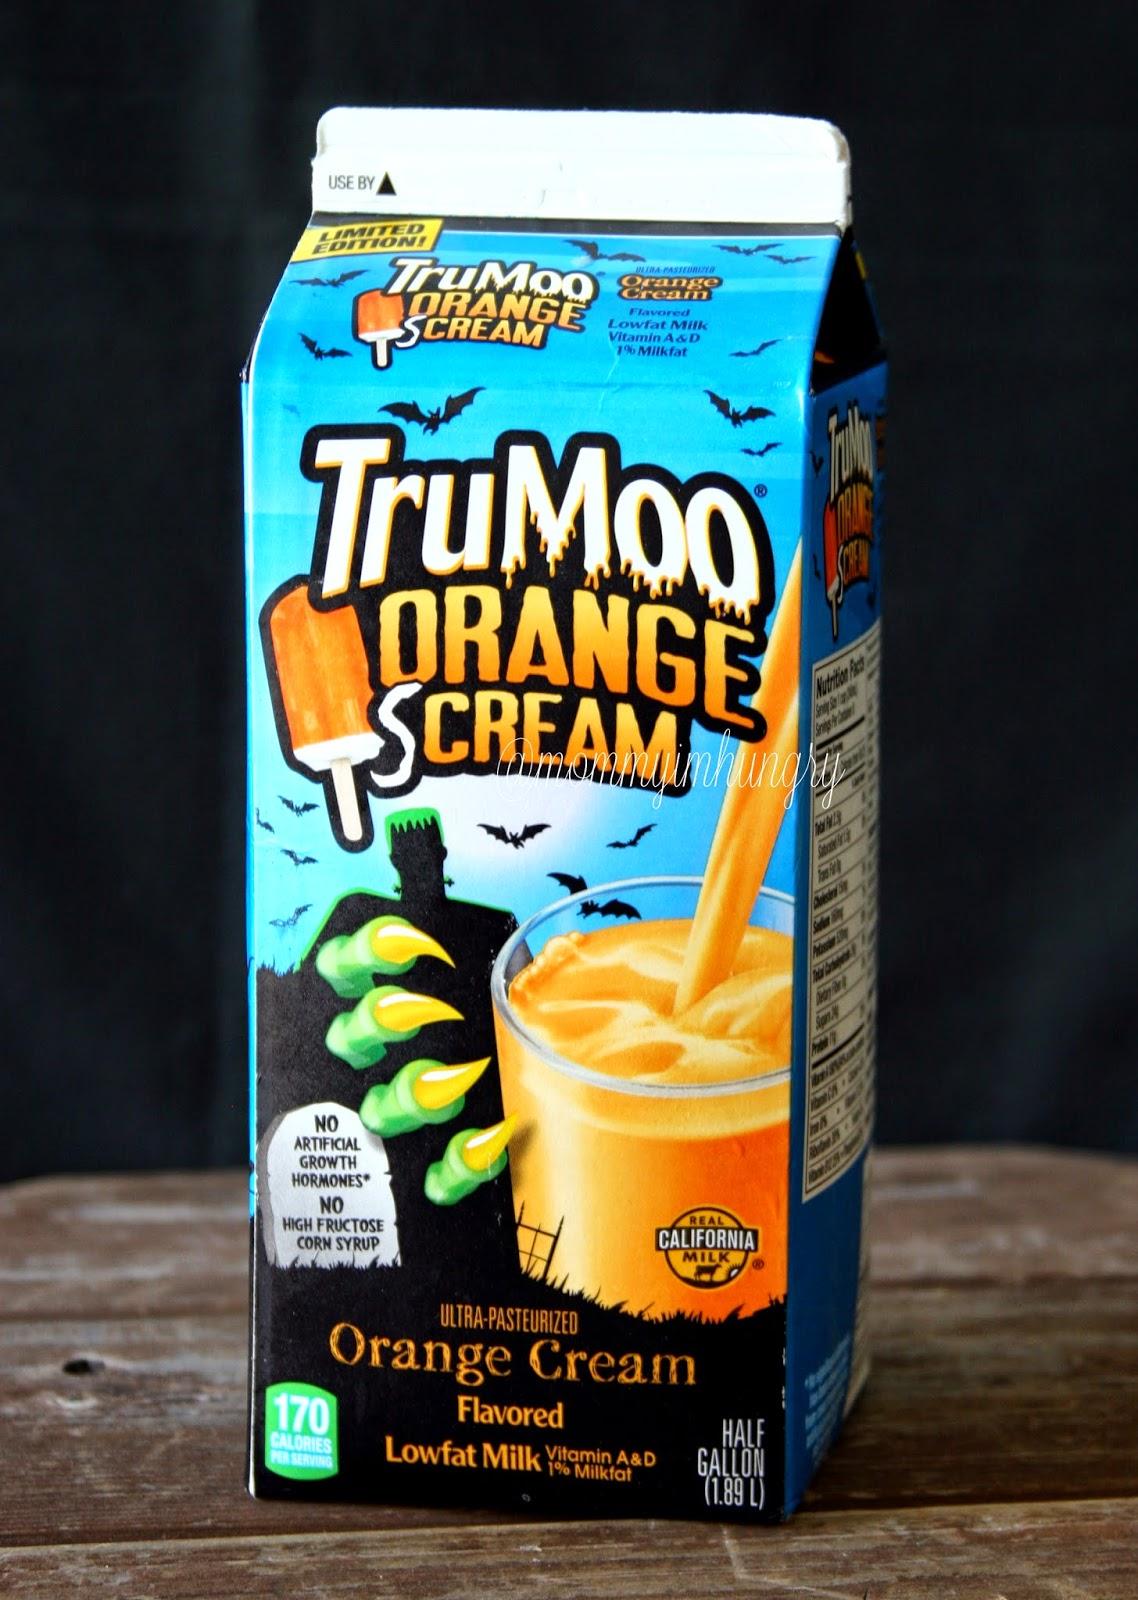 limited edition trumoo orange scream review & orange brownie trifle recipe